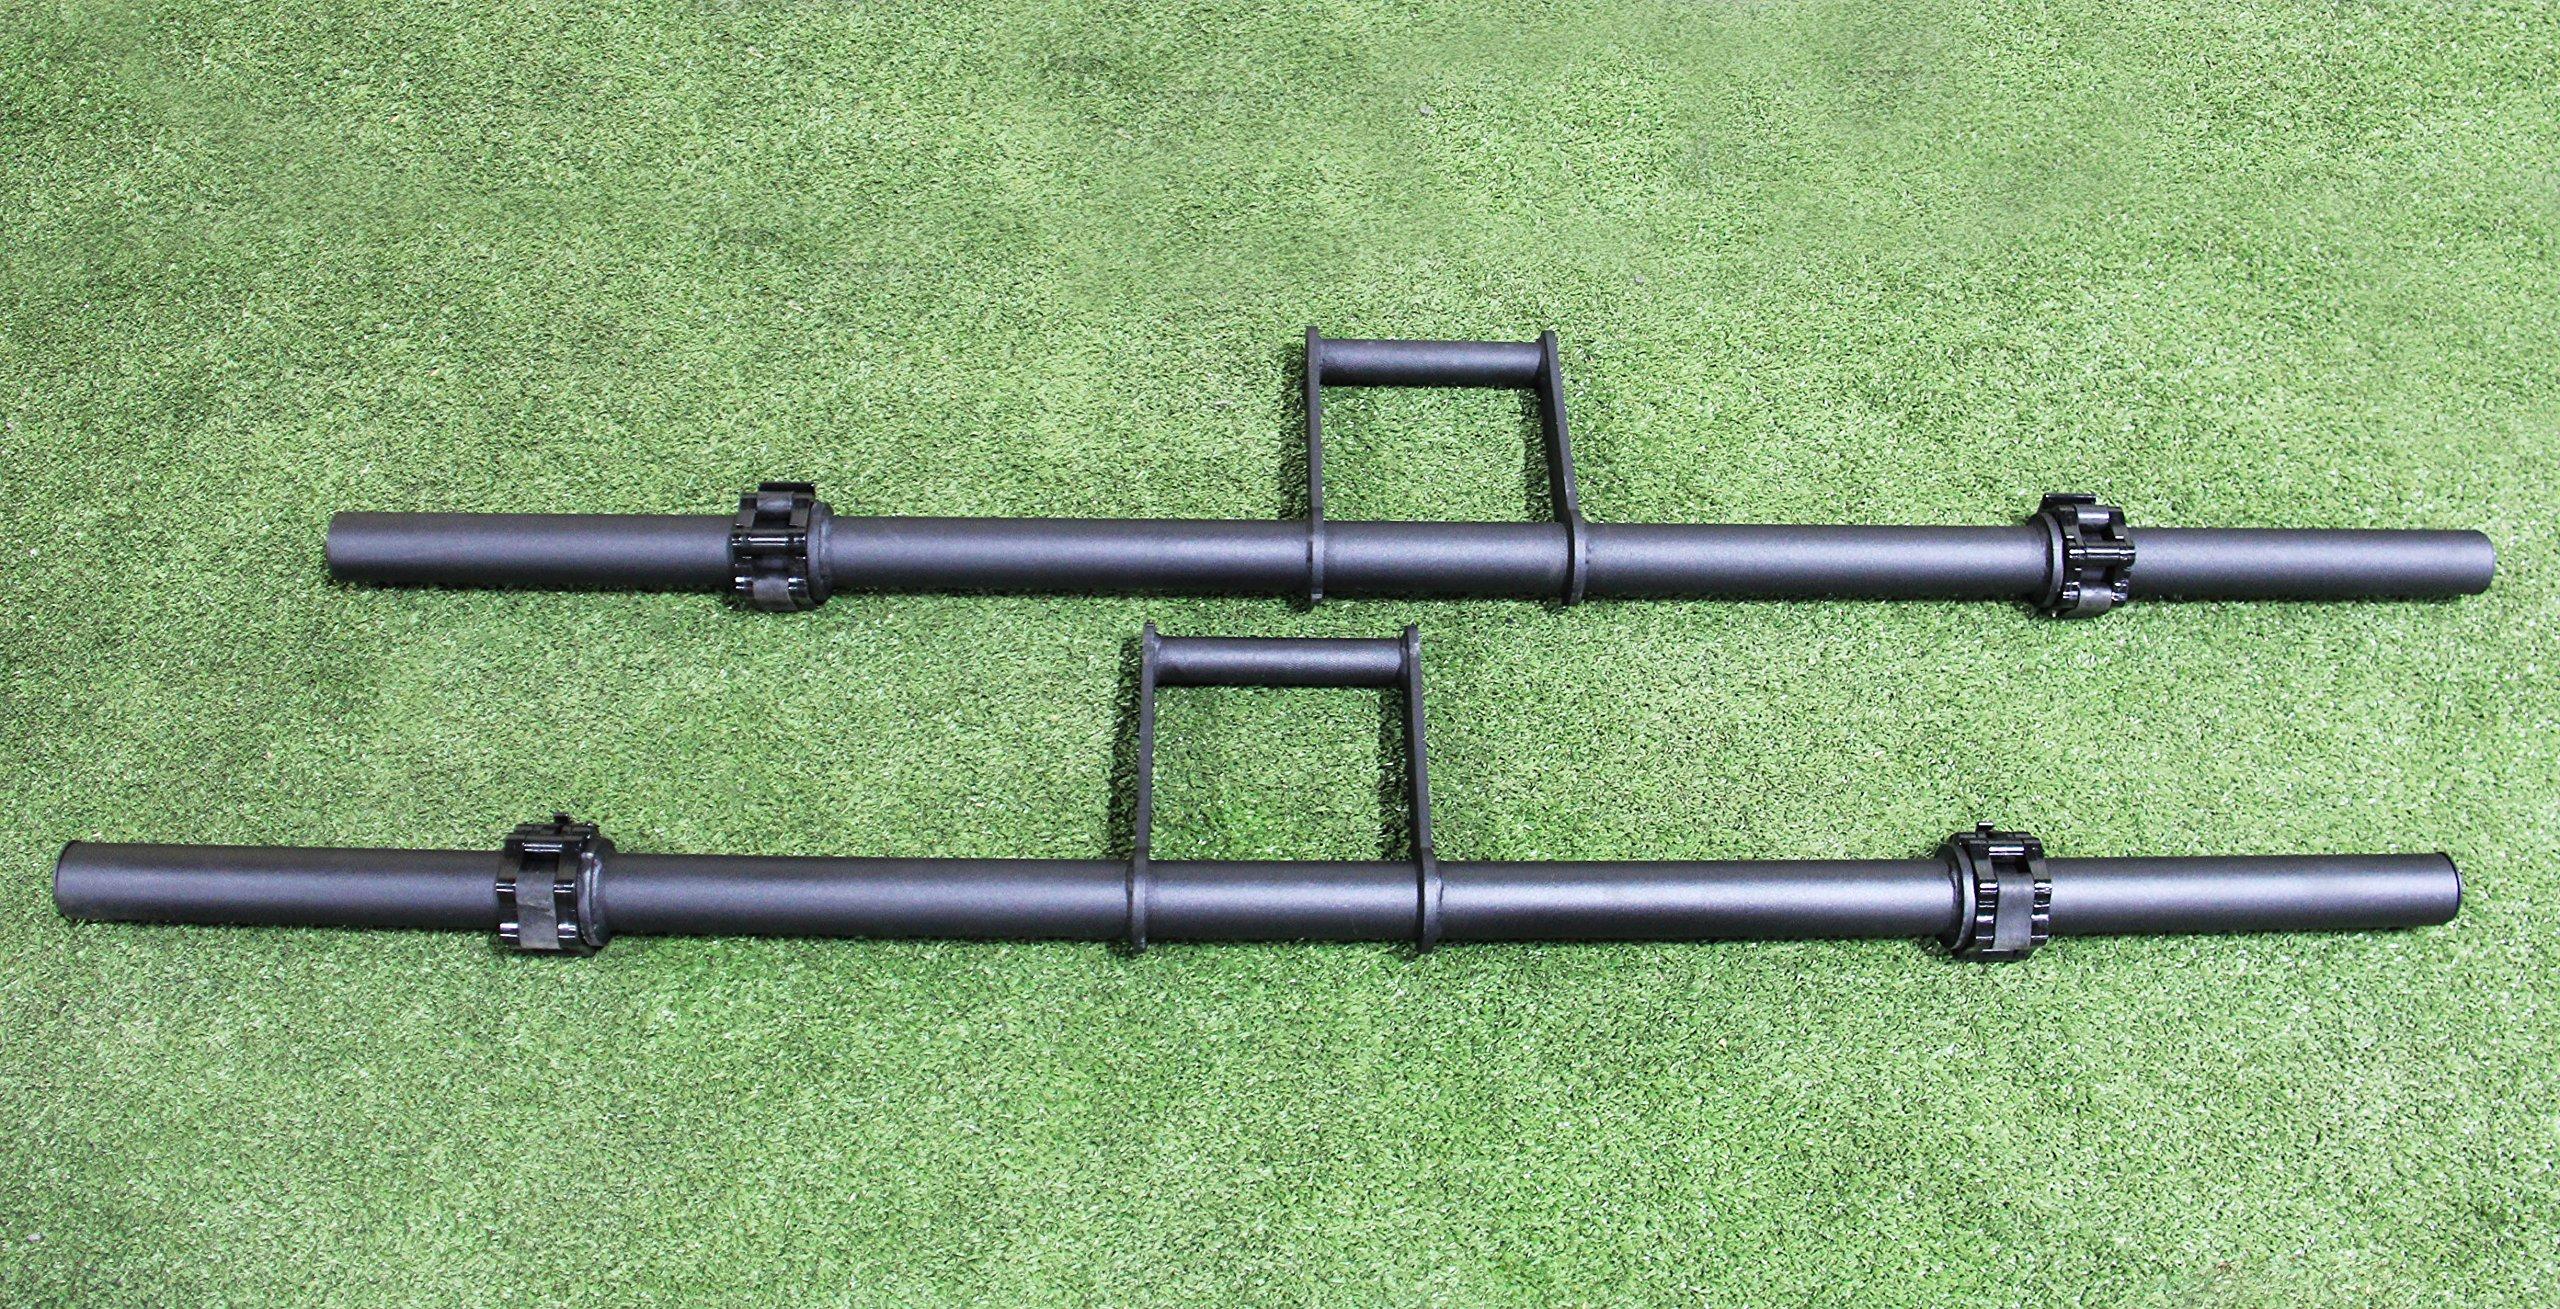 Strencor Farmer Carry Handles w/ 4x LockJaw Heavy Duty Collars (pair) by Strencor Fitness